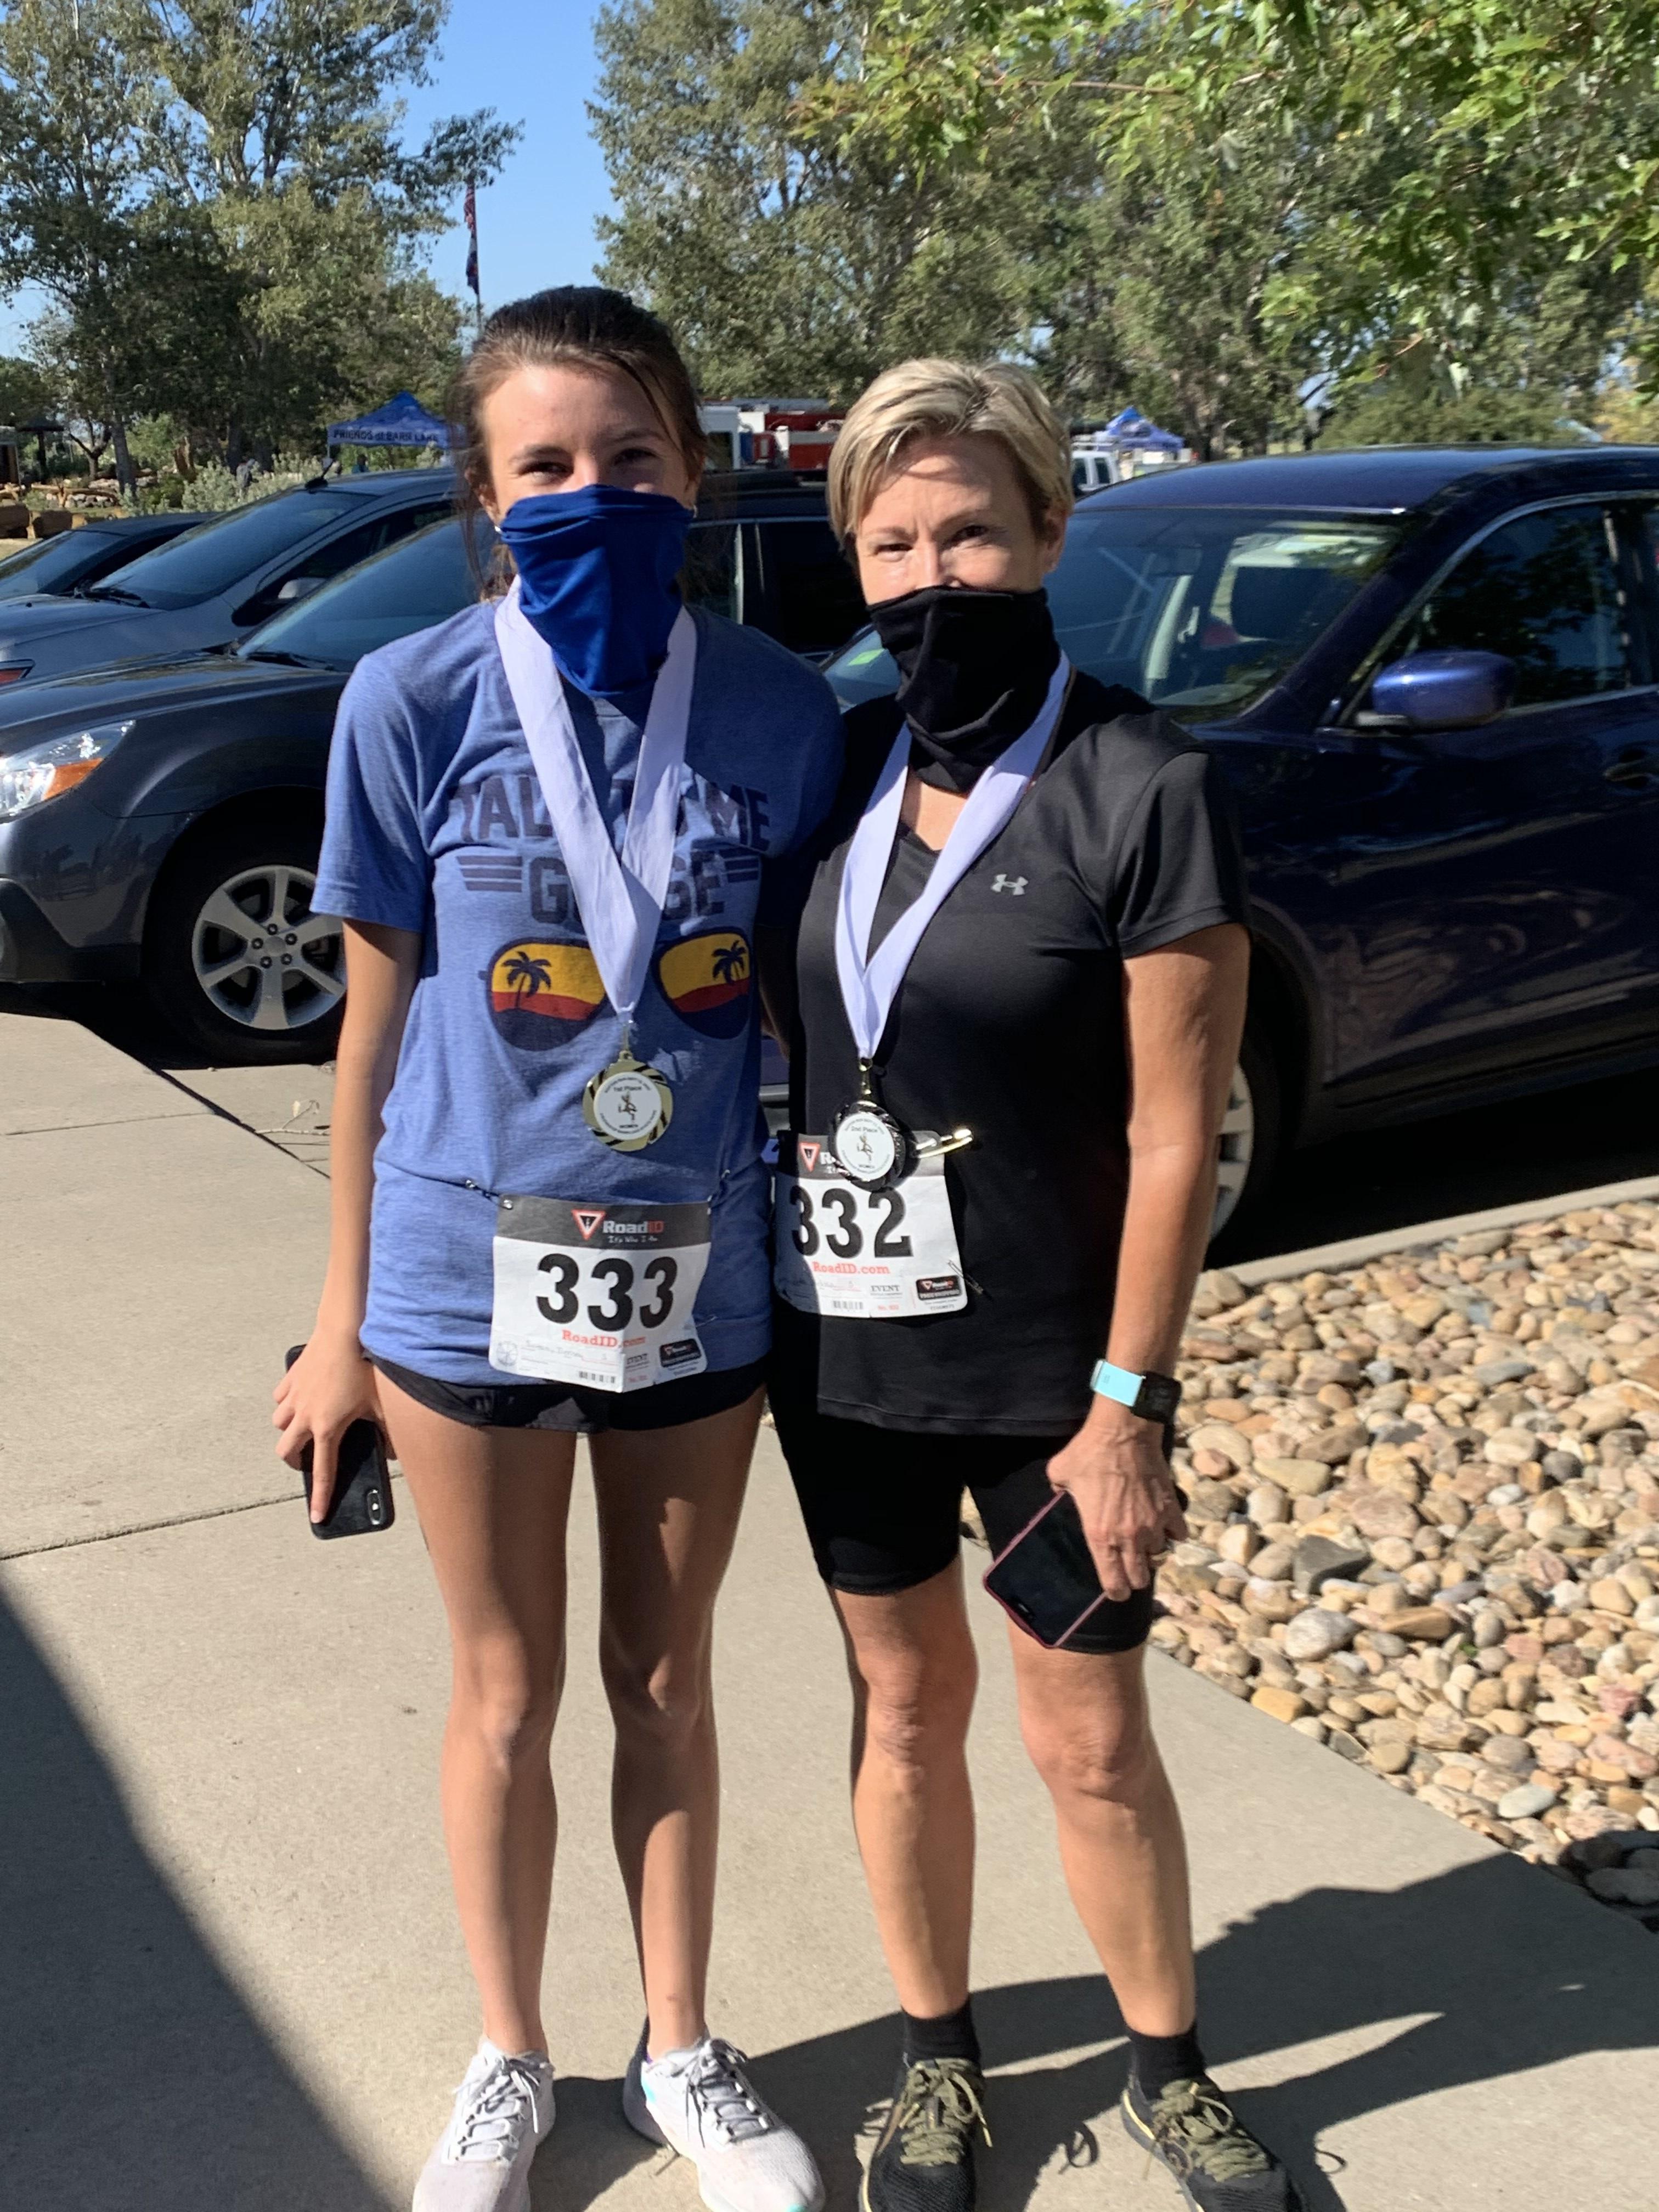 Raptor Run 5K 2020 Medal Winners